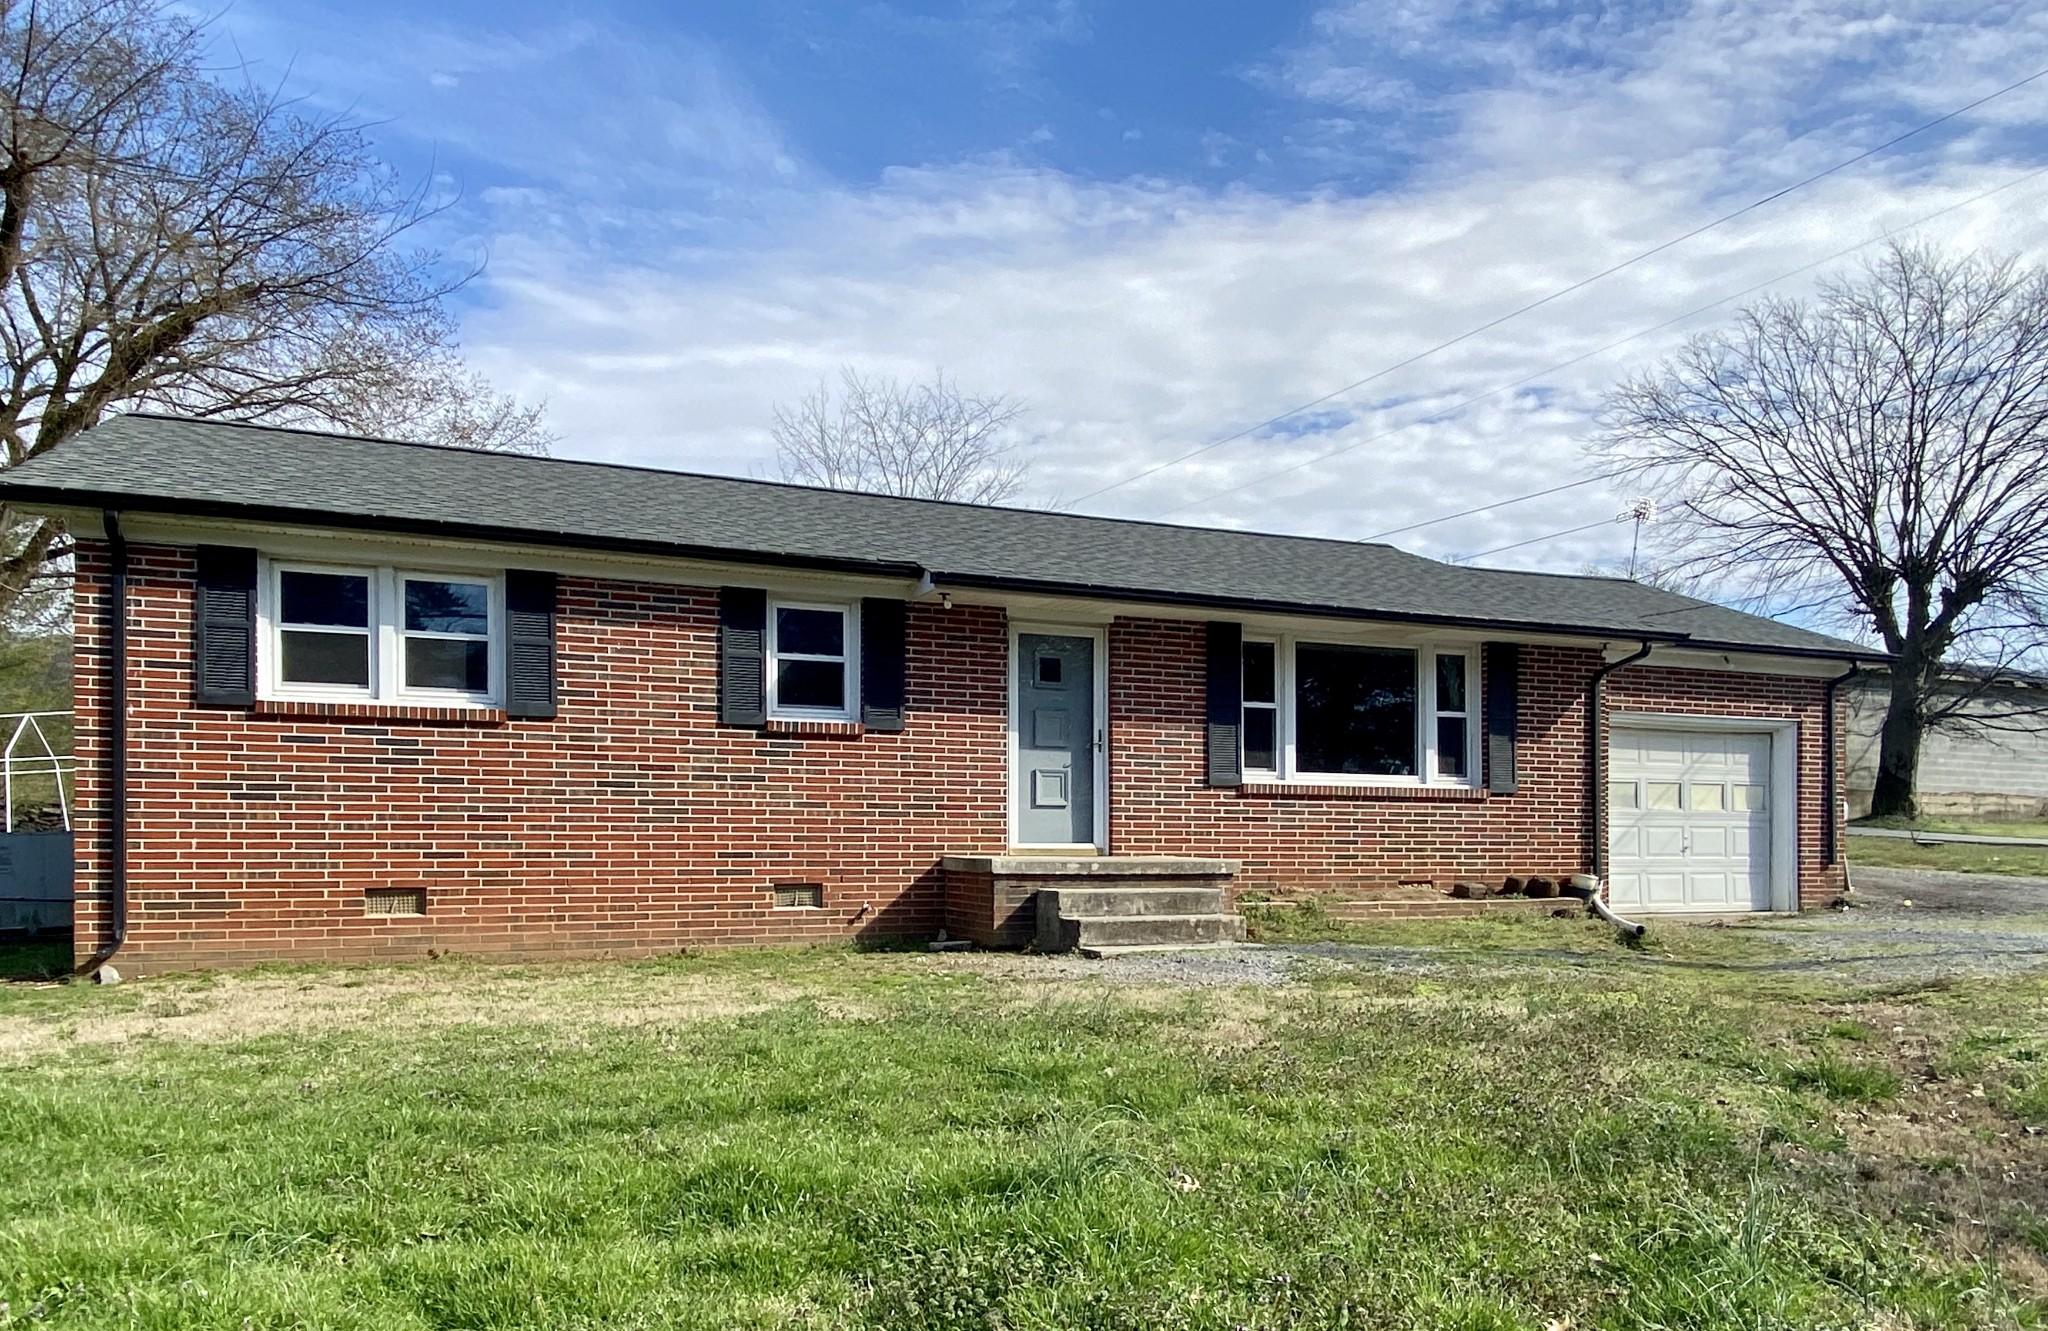 300 College St, Liberty, TN 37095 - Liberty, TN real estate listing